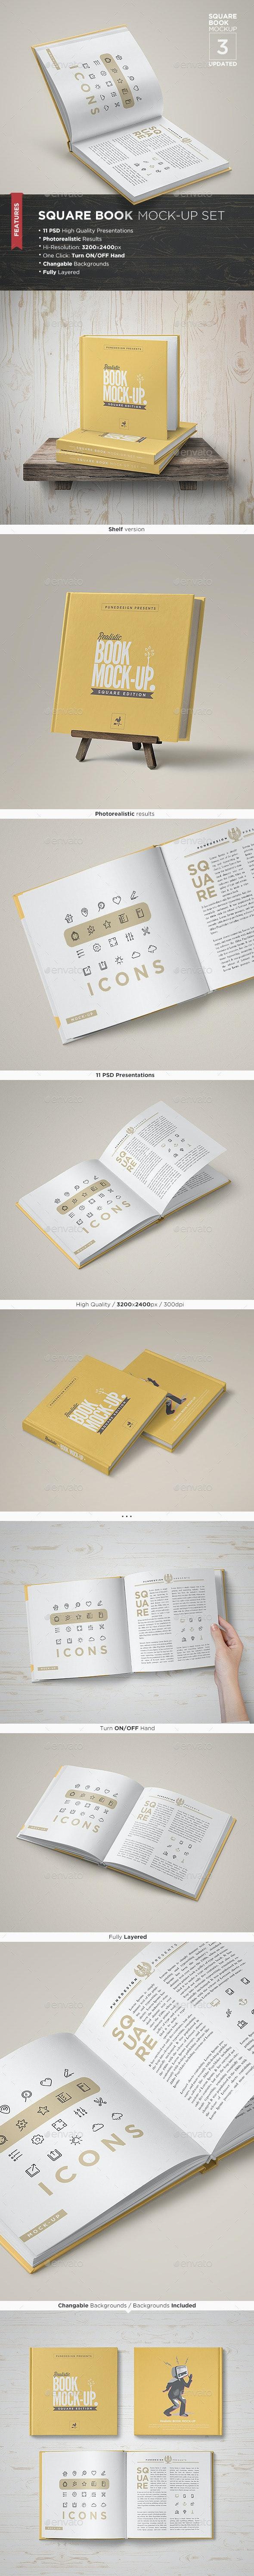 Square Book Mock-Up Set 3 - Books Print